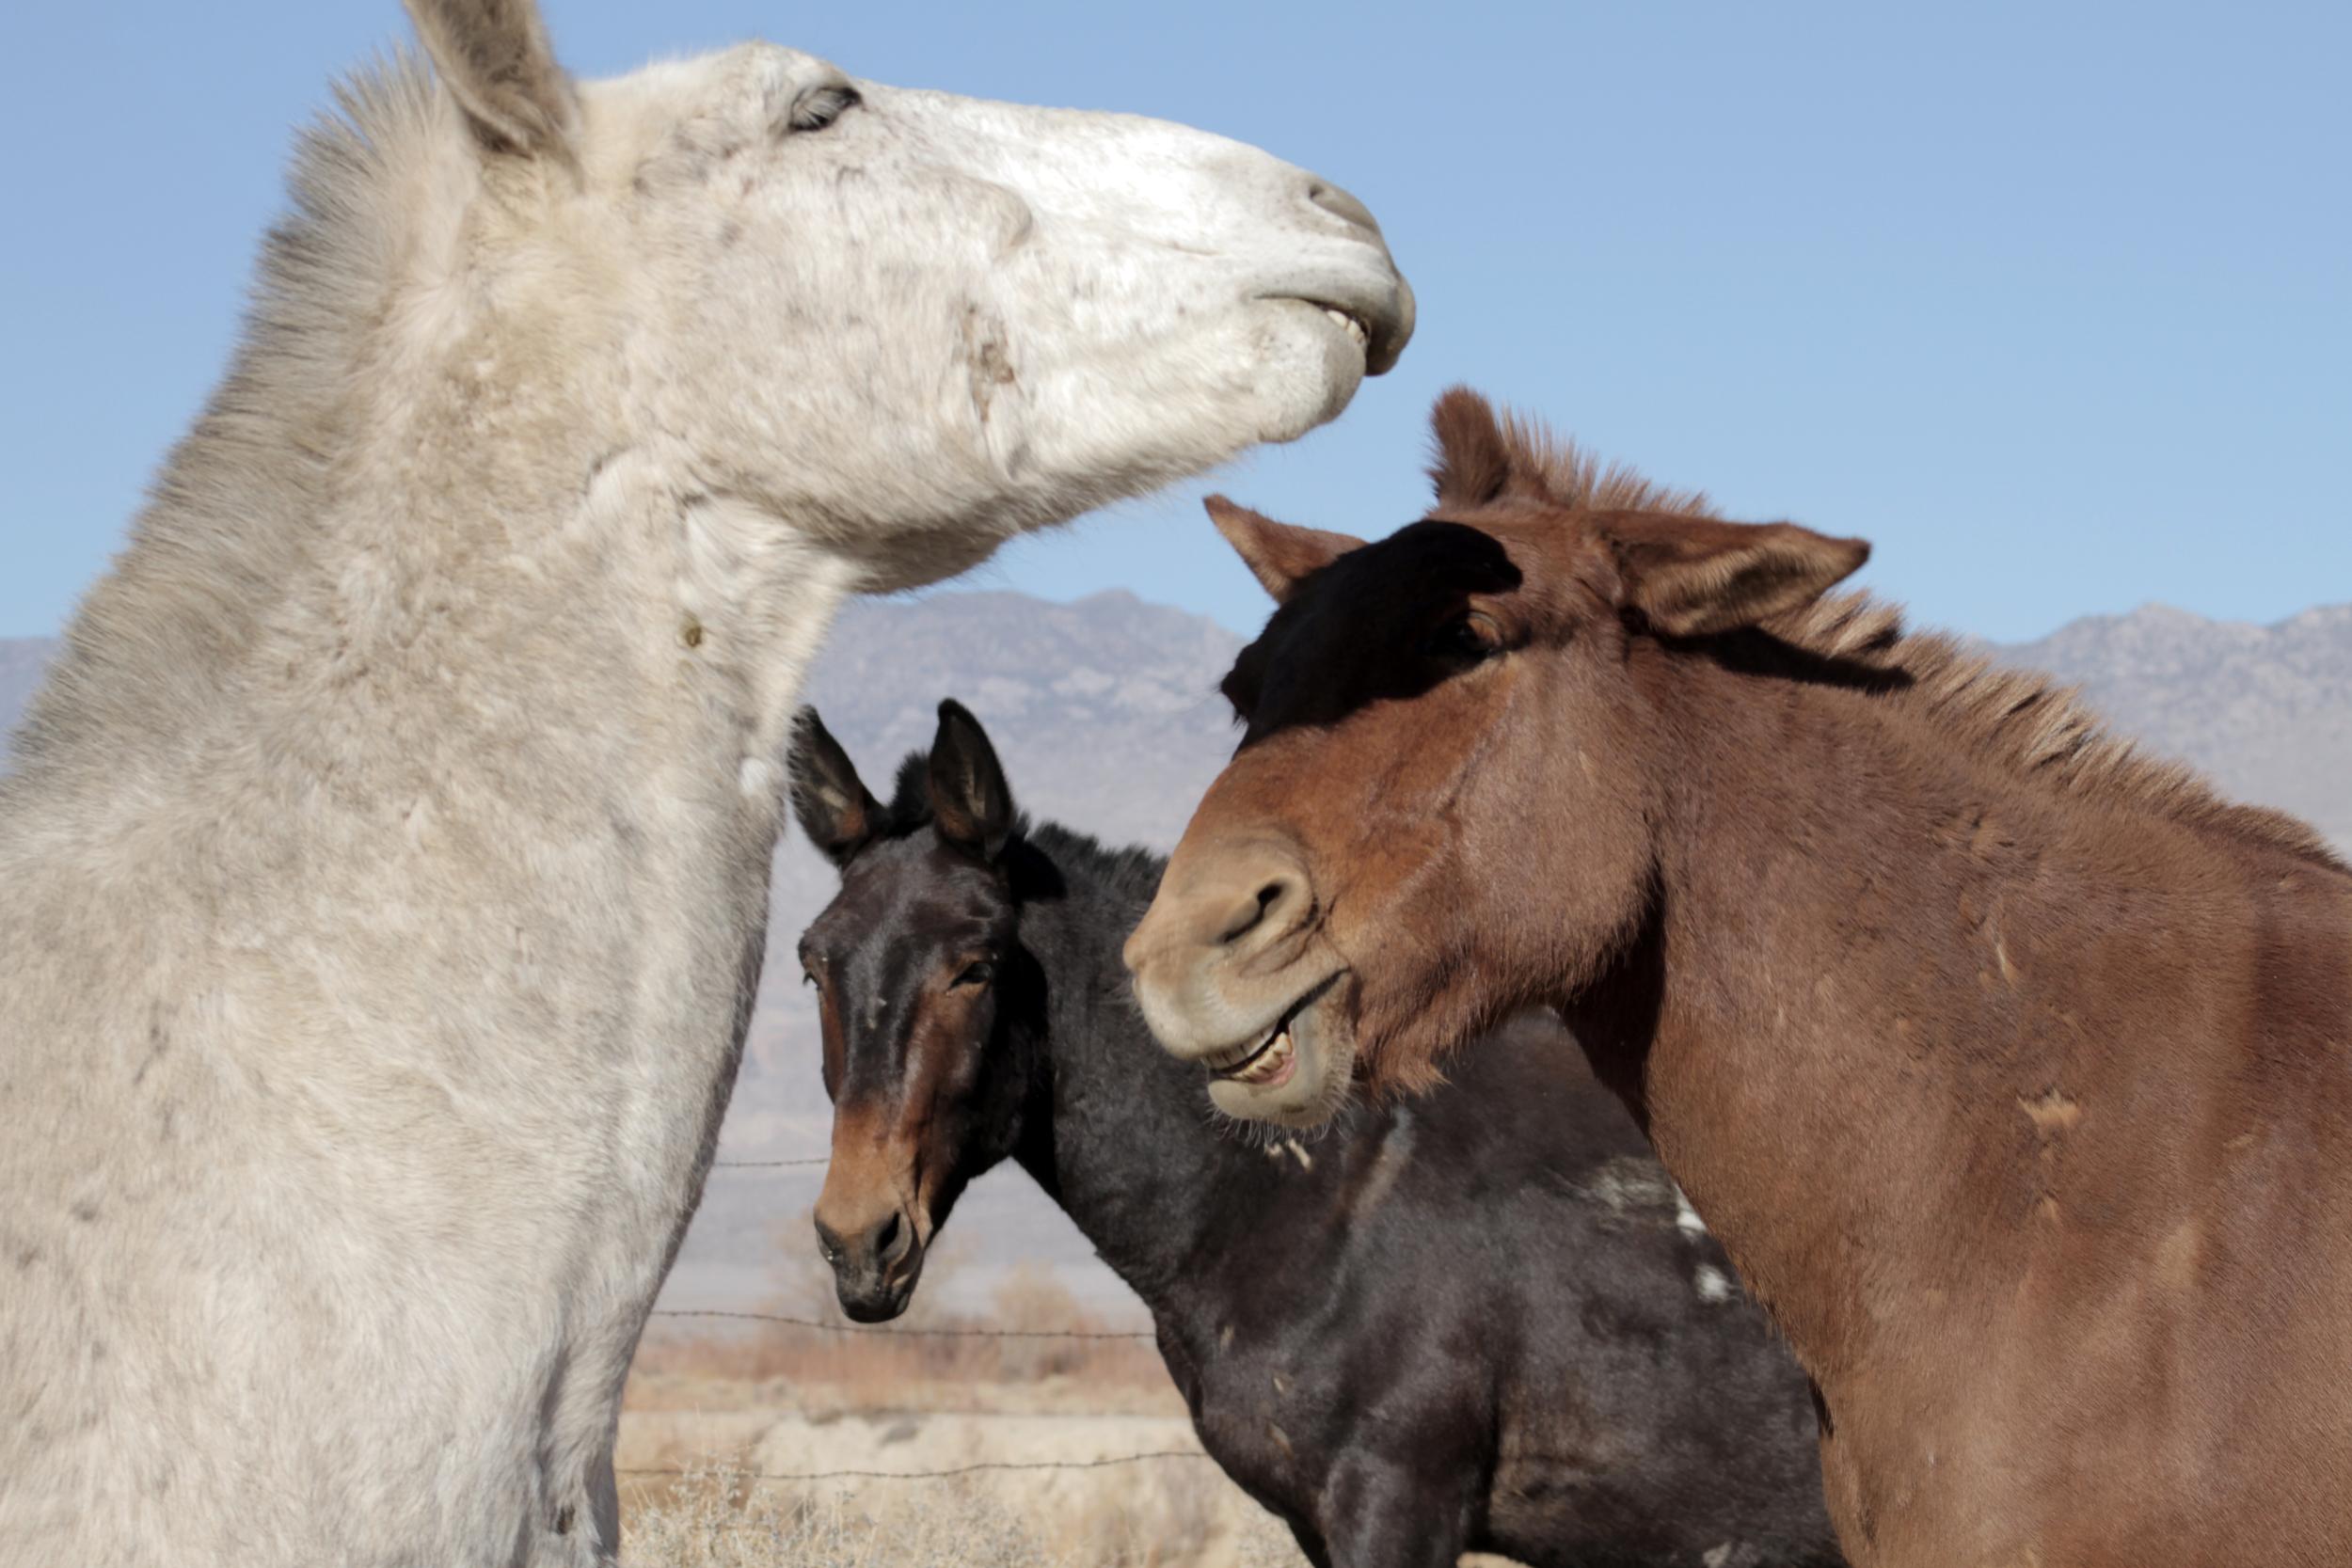 HORSES_LAUGHING.jpg